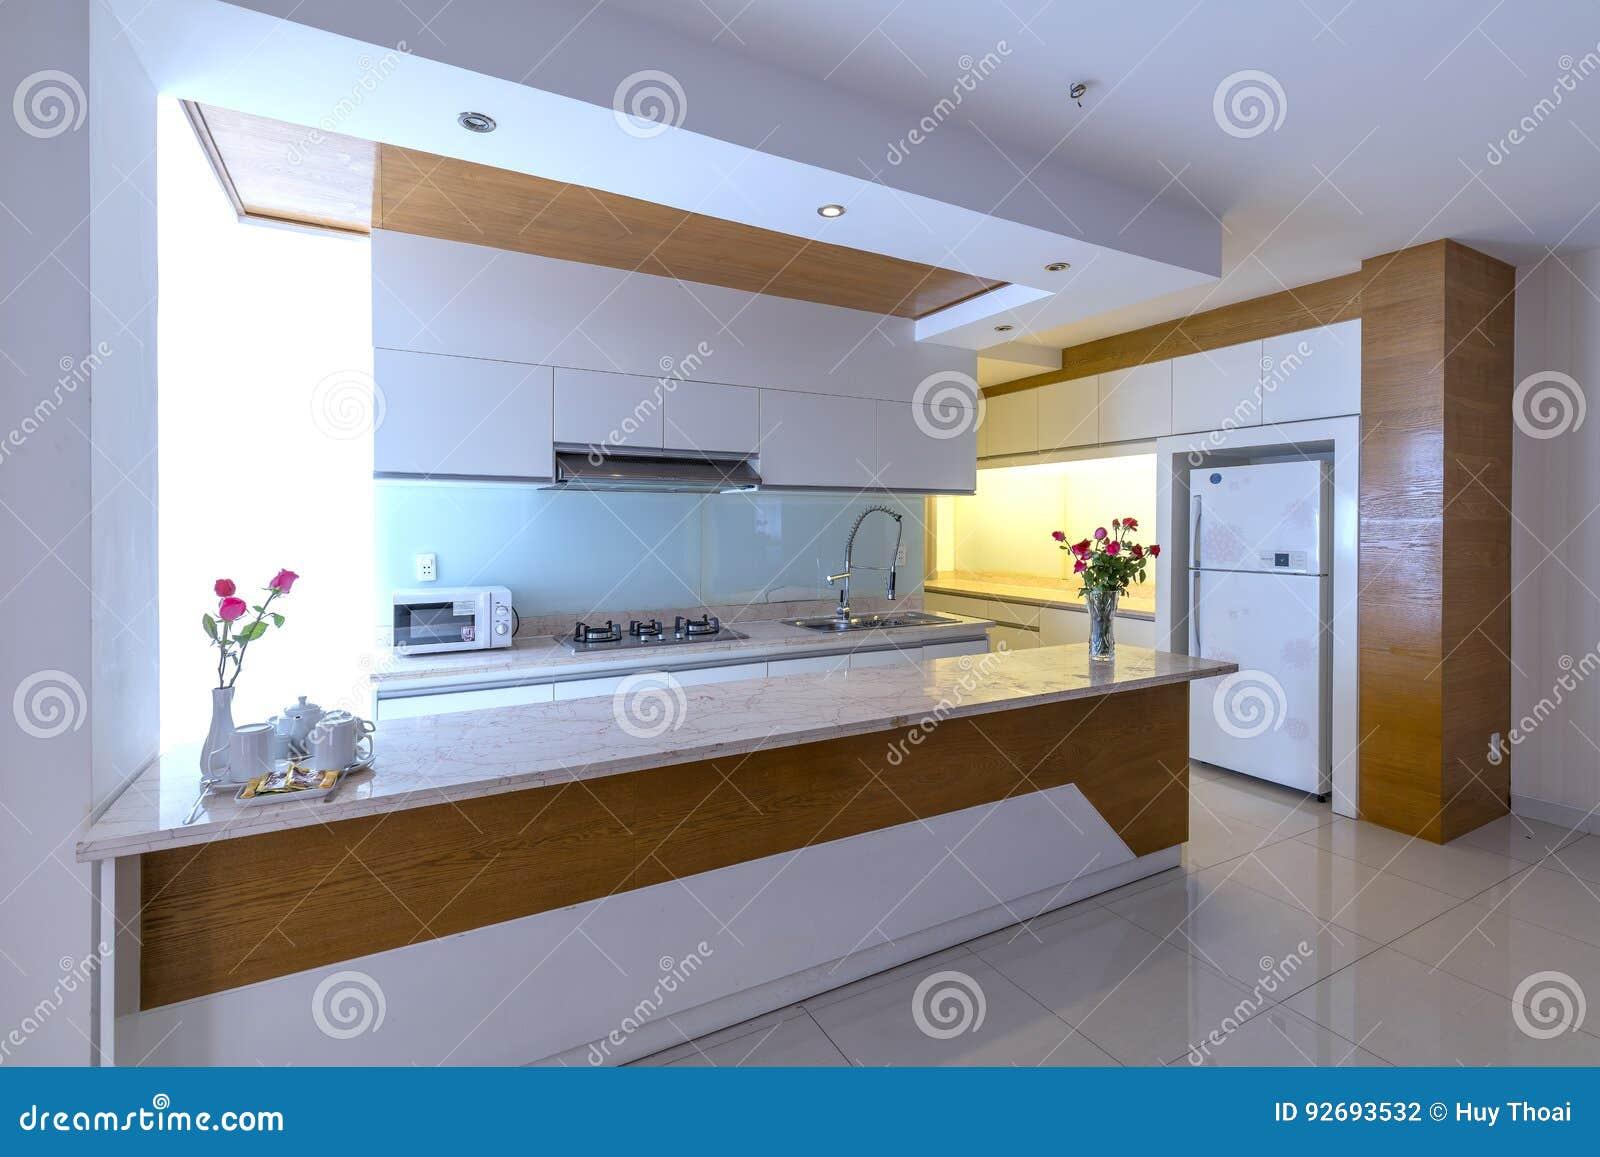 https://thumbs.dreamstime.com/z/moderne-eetkamer-keuken-luxeflats-92693532.jpg